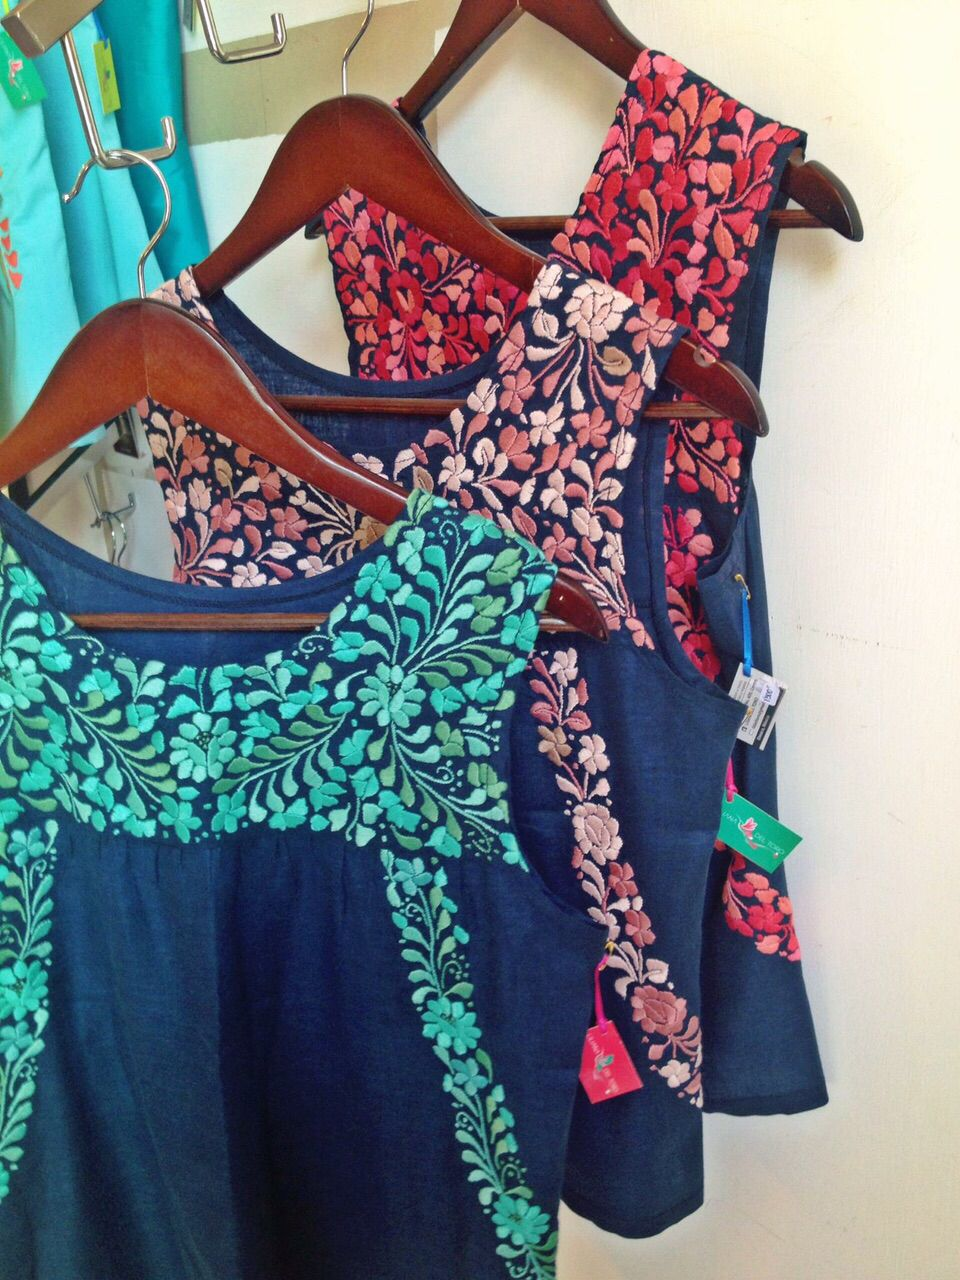 Bordados oaxaqueños | blusas | Pinterest | Embroidery, Mexicans and ...